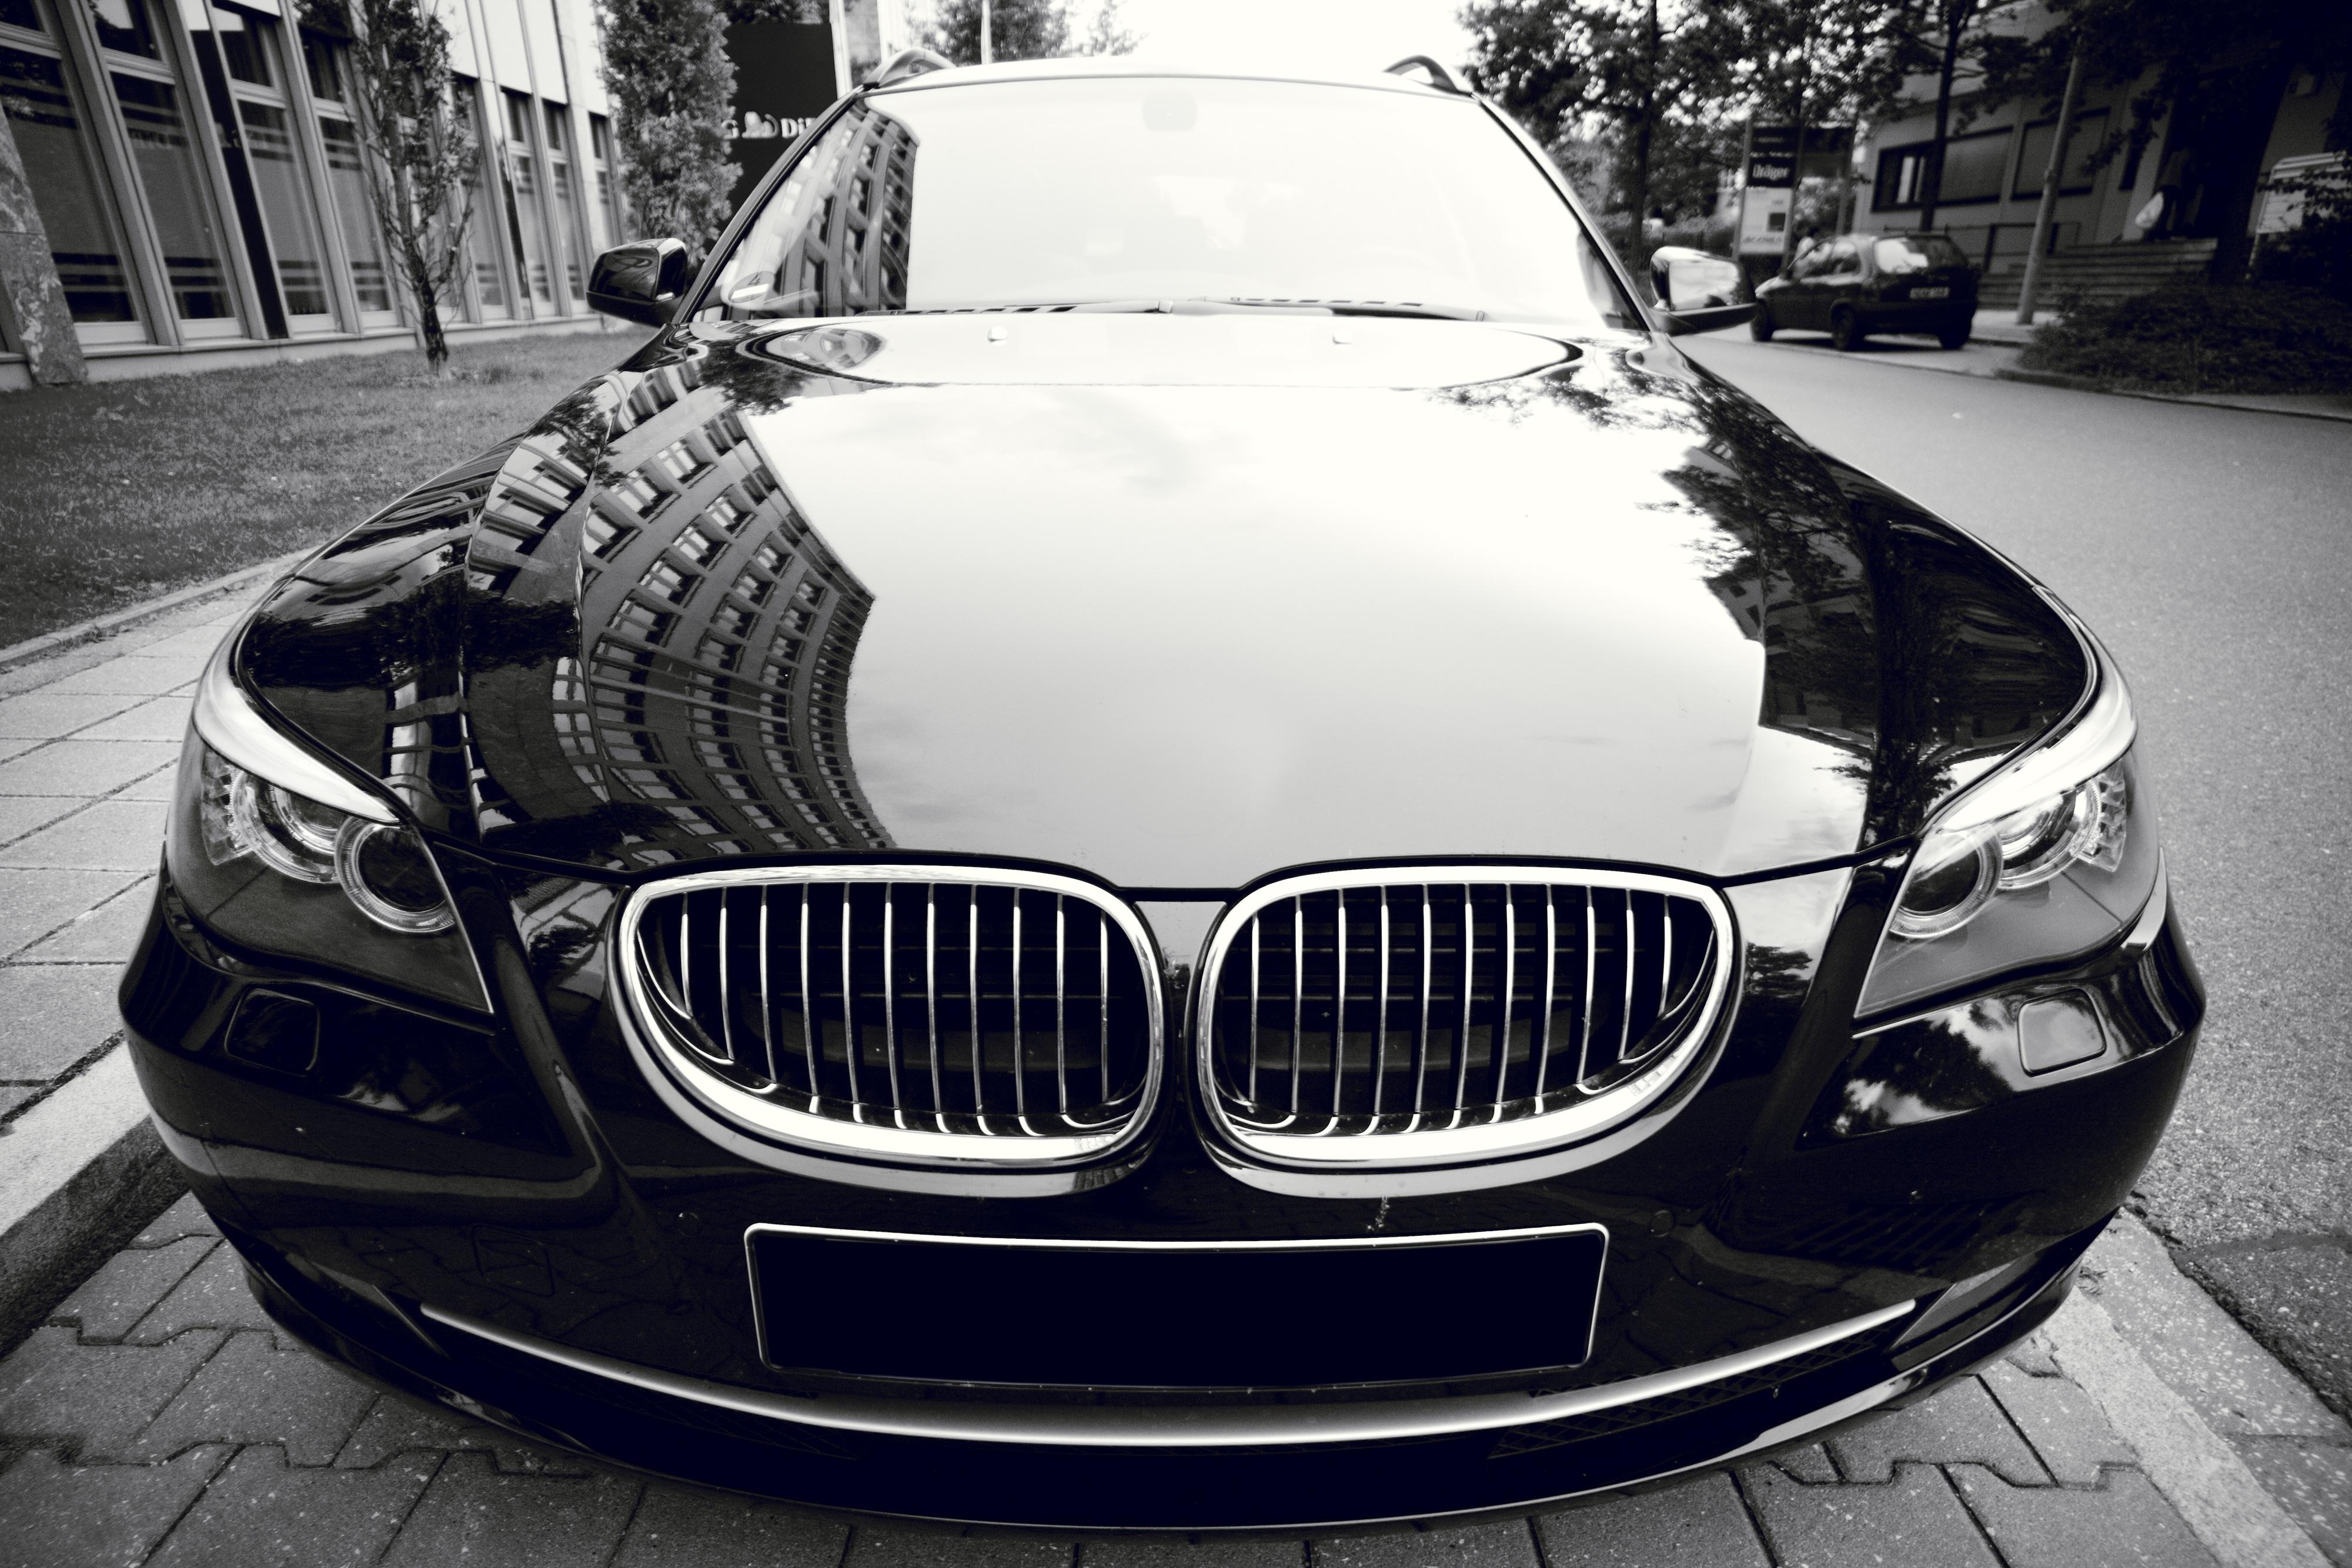 Hd Wallpaper Of Cool Cars Black Mercedes Benz Car 183 Free Stock Photo